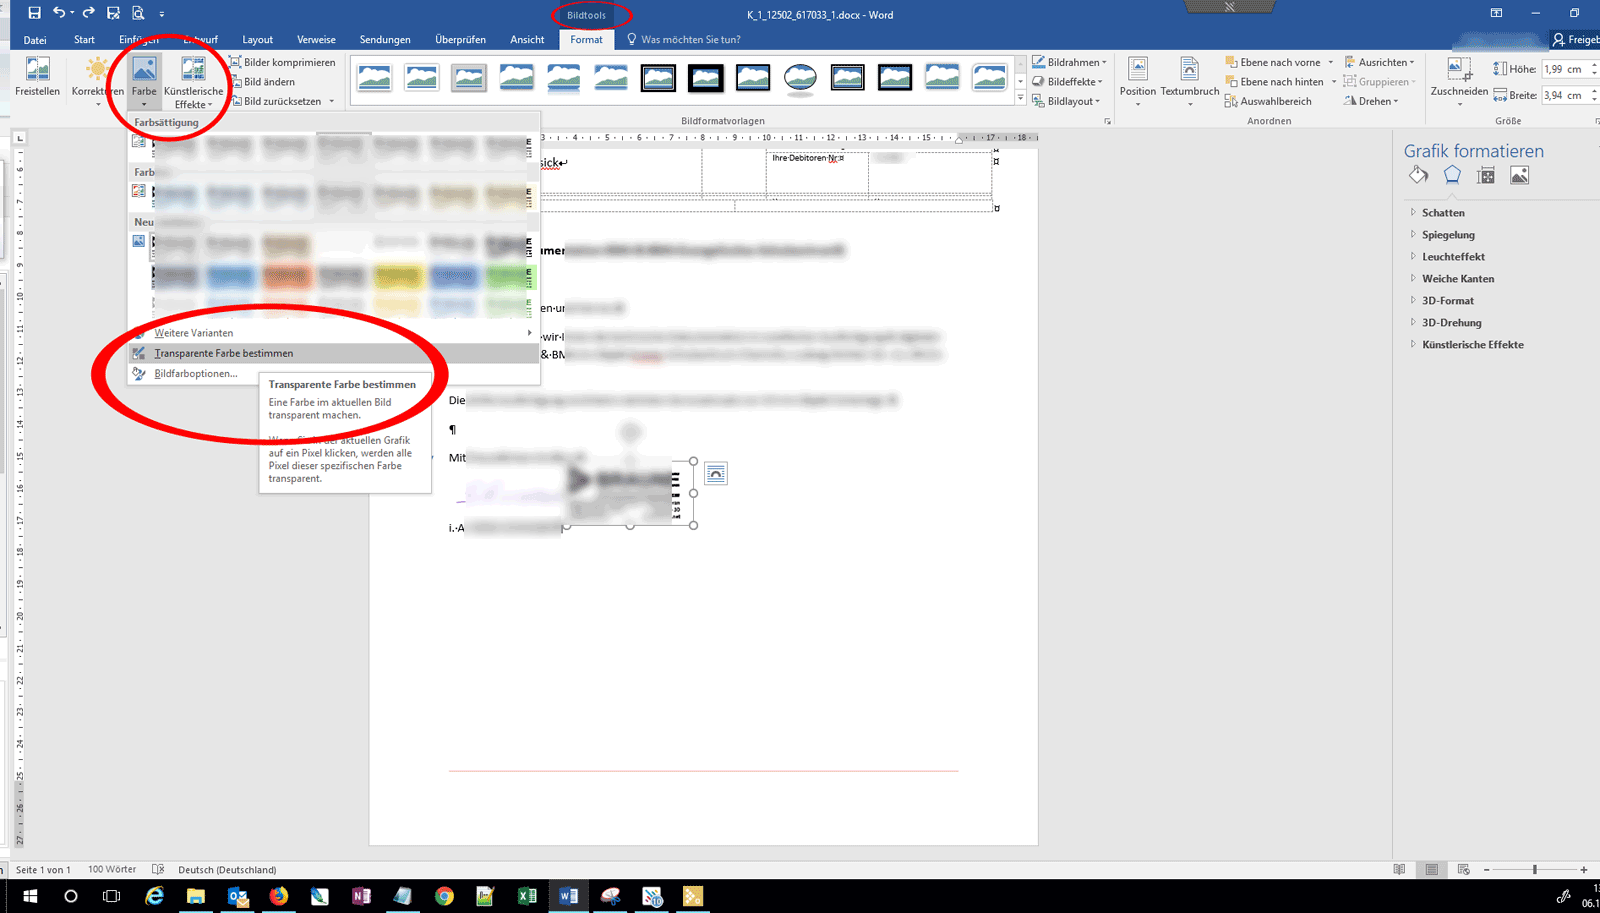 Transparente Farbe in Microsoft Word auswählen (Office 2016 / 2019)